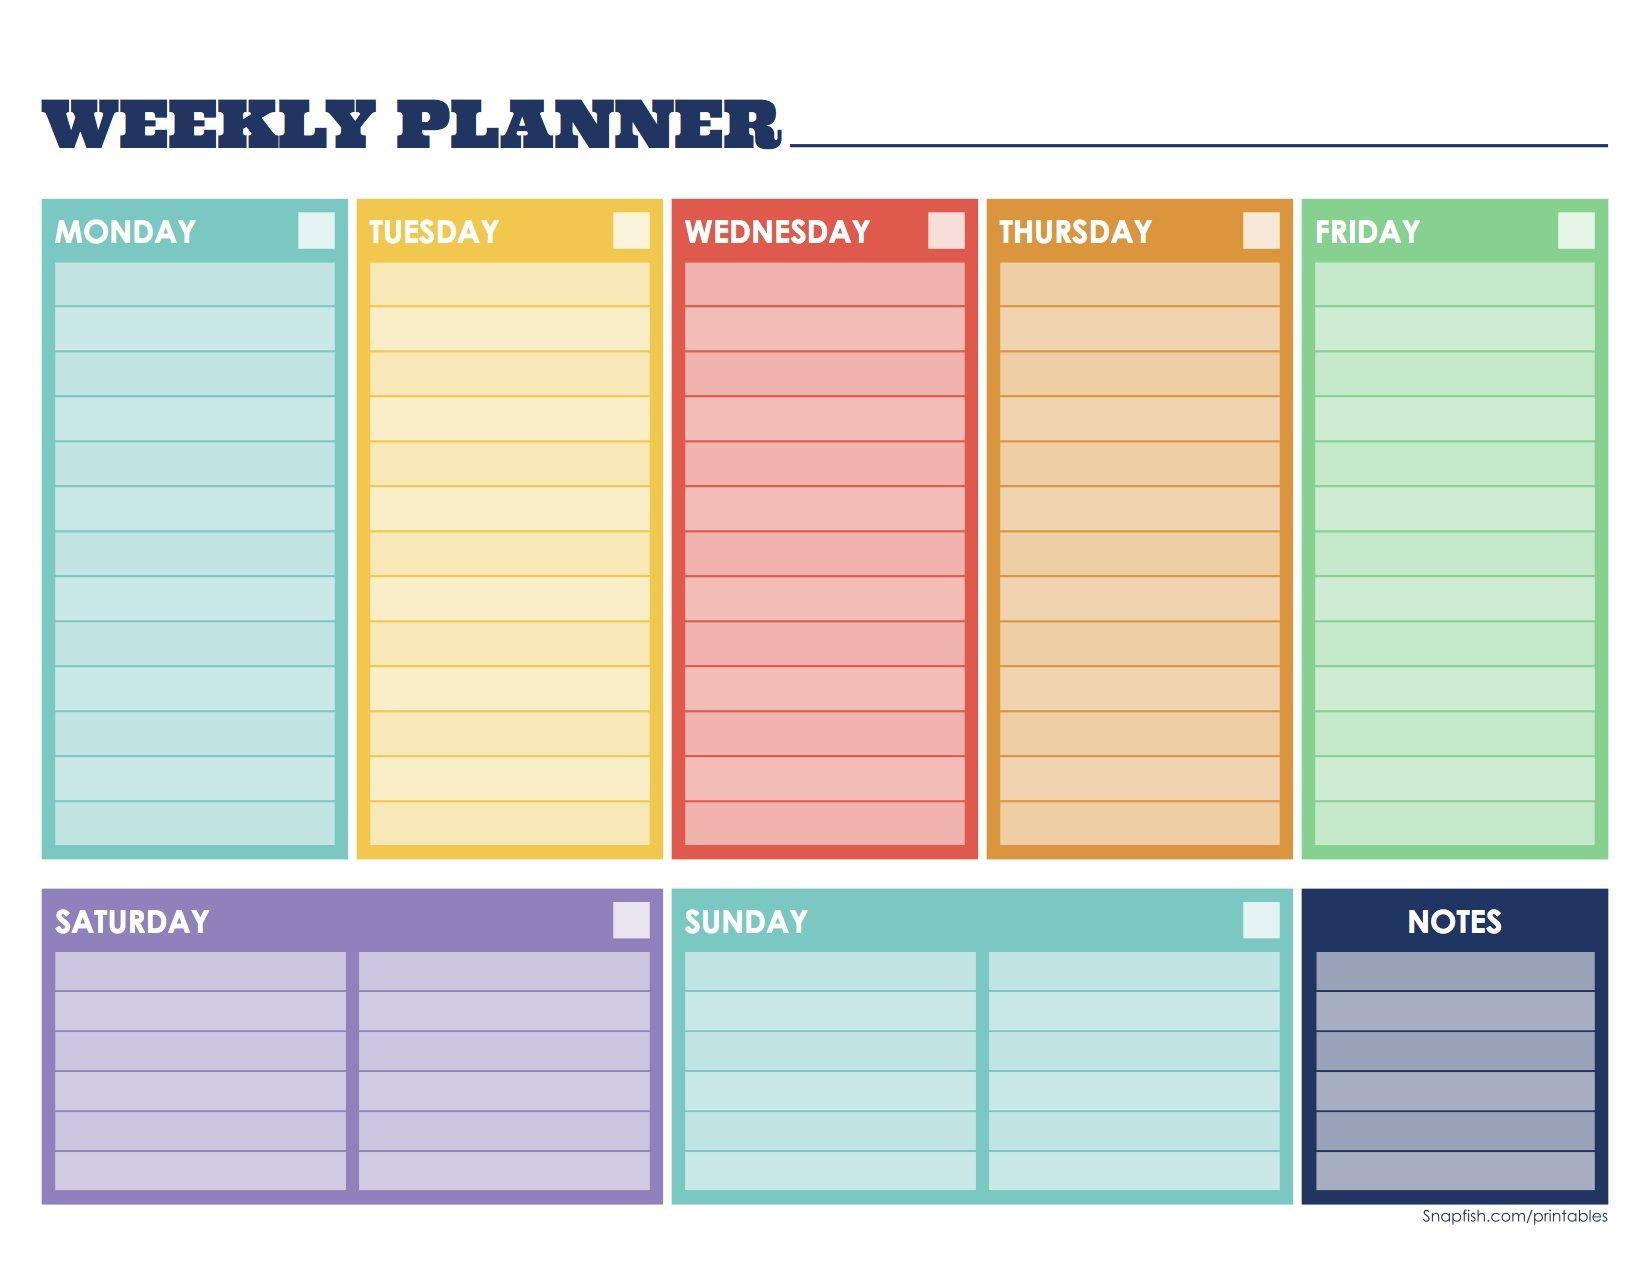 Weekly planner organization ideas pinterest for Planner pinterest